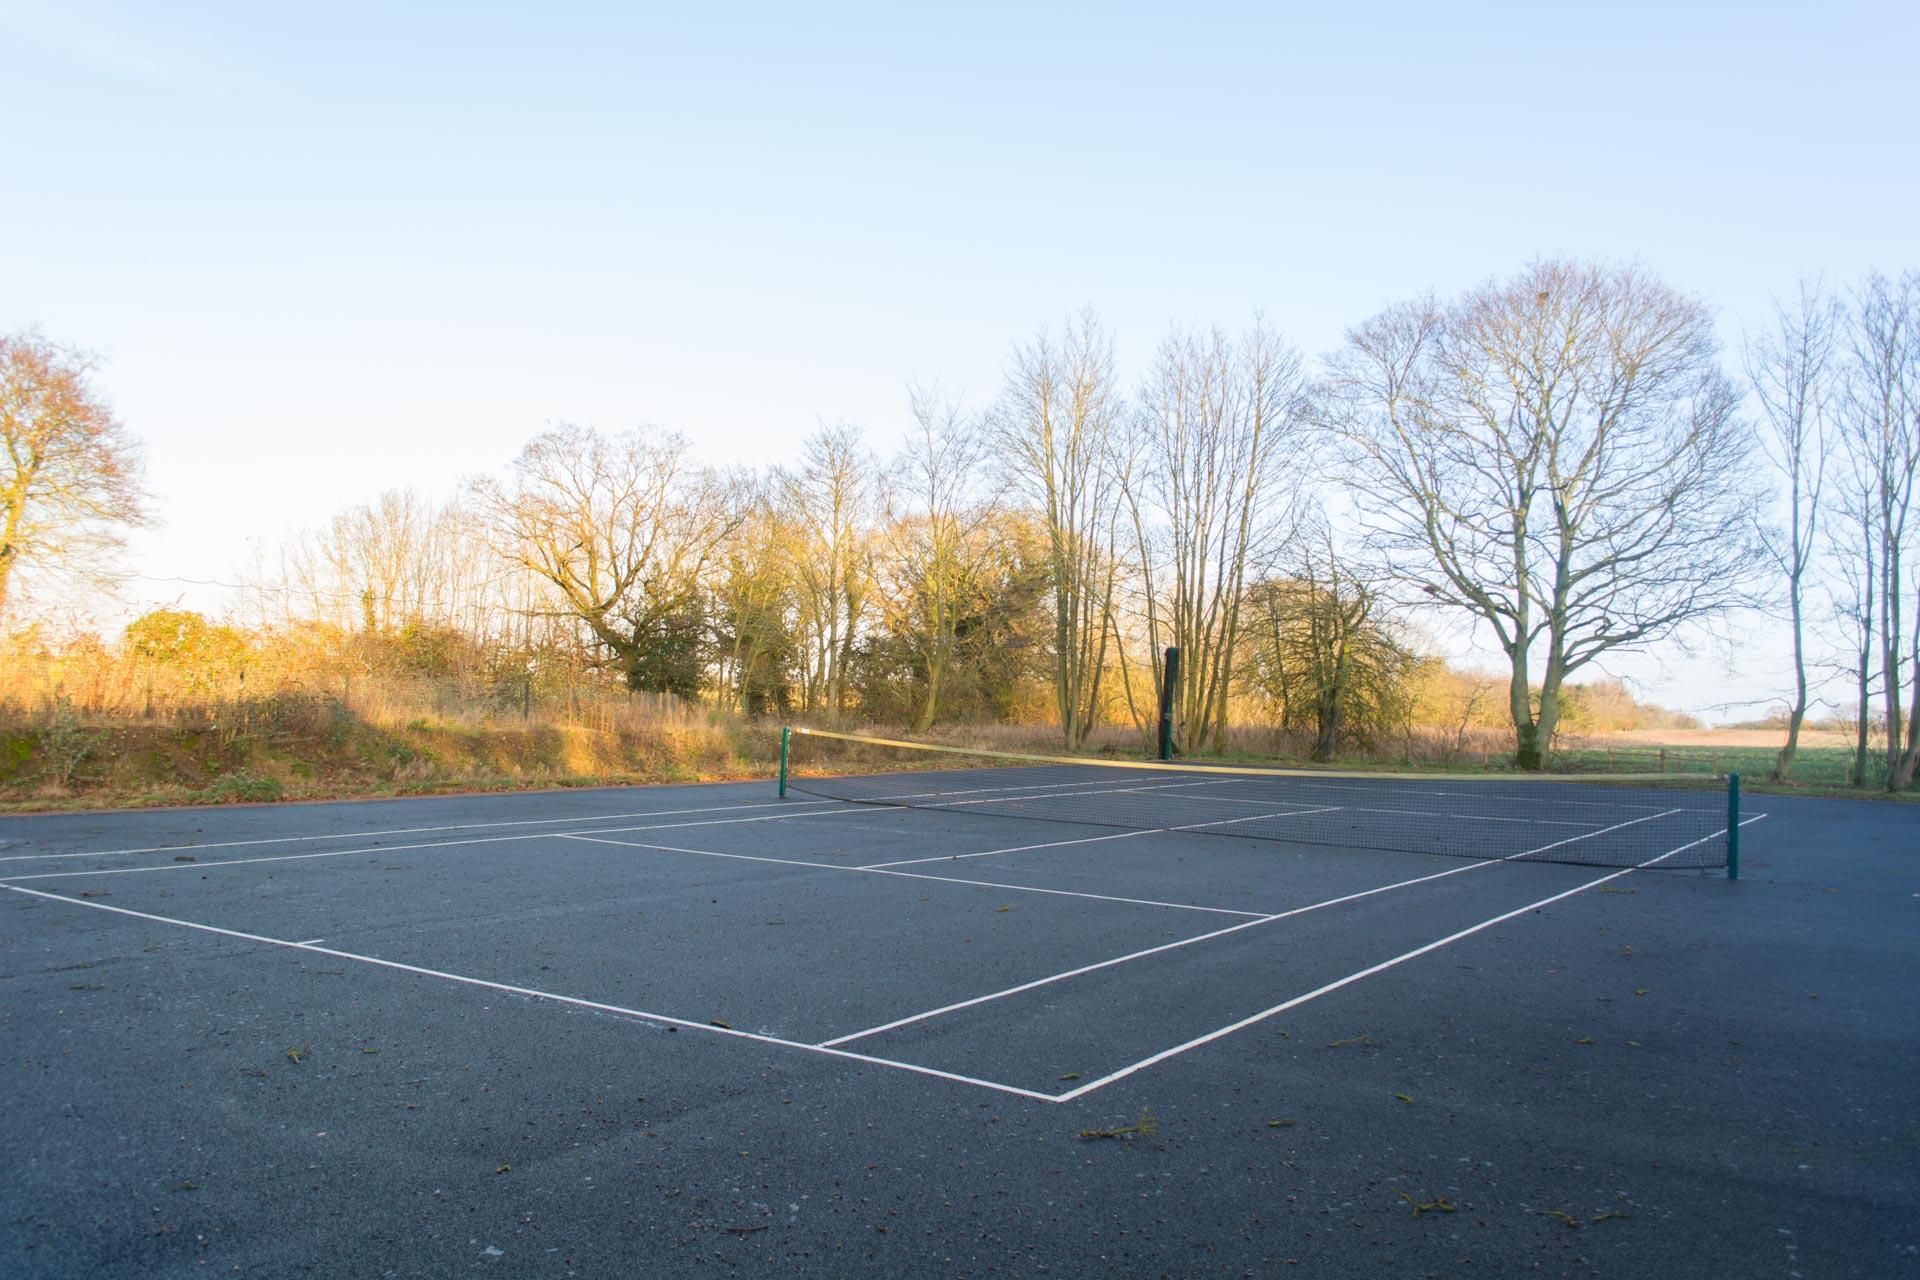 Heckingham Park's outdoor tennis courts.